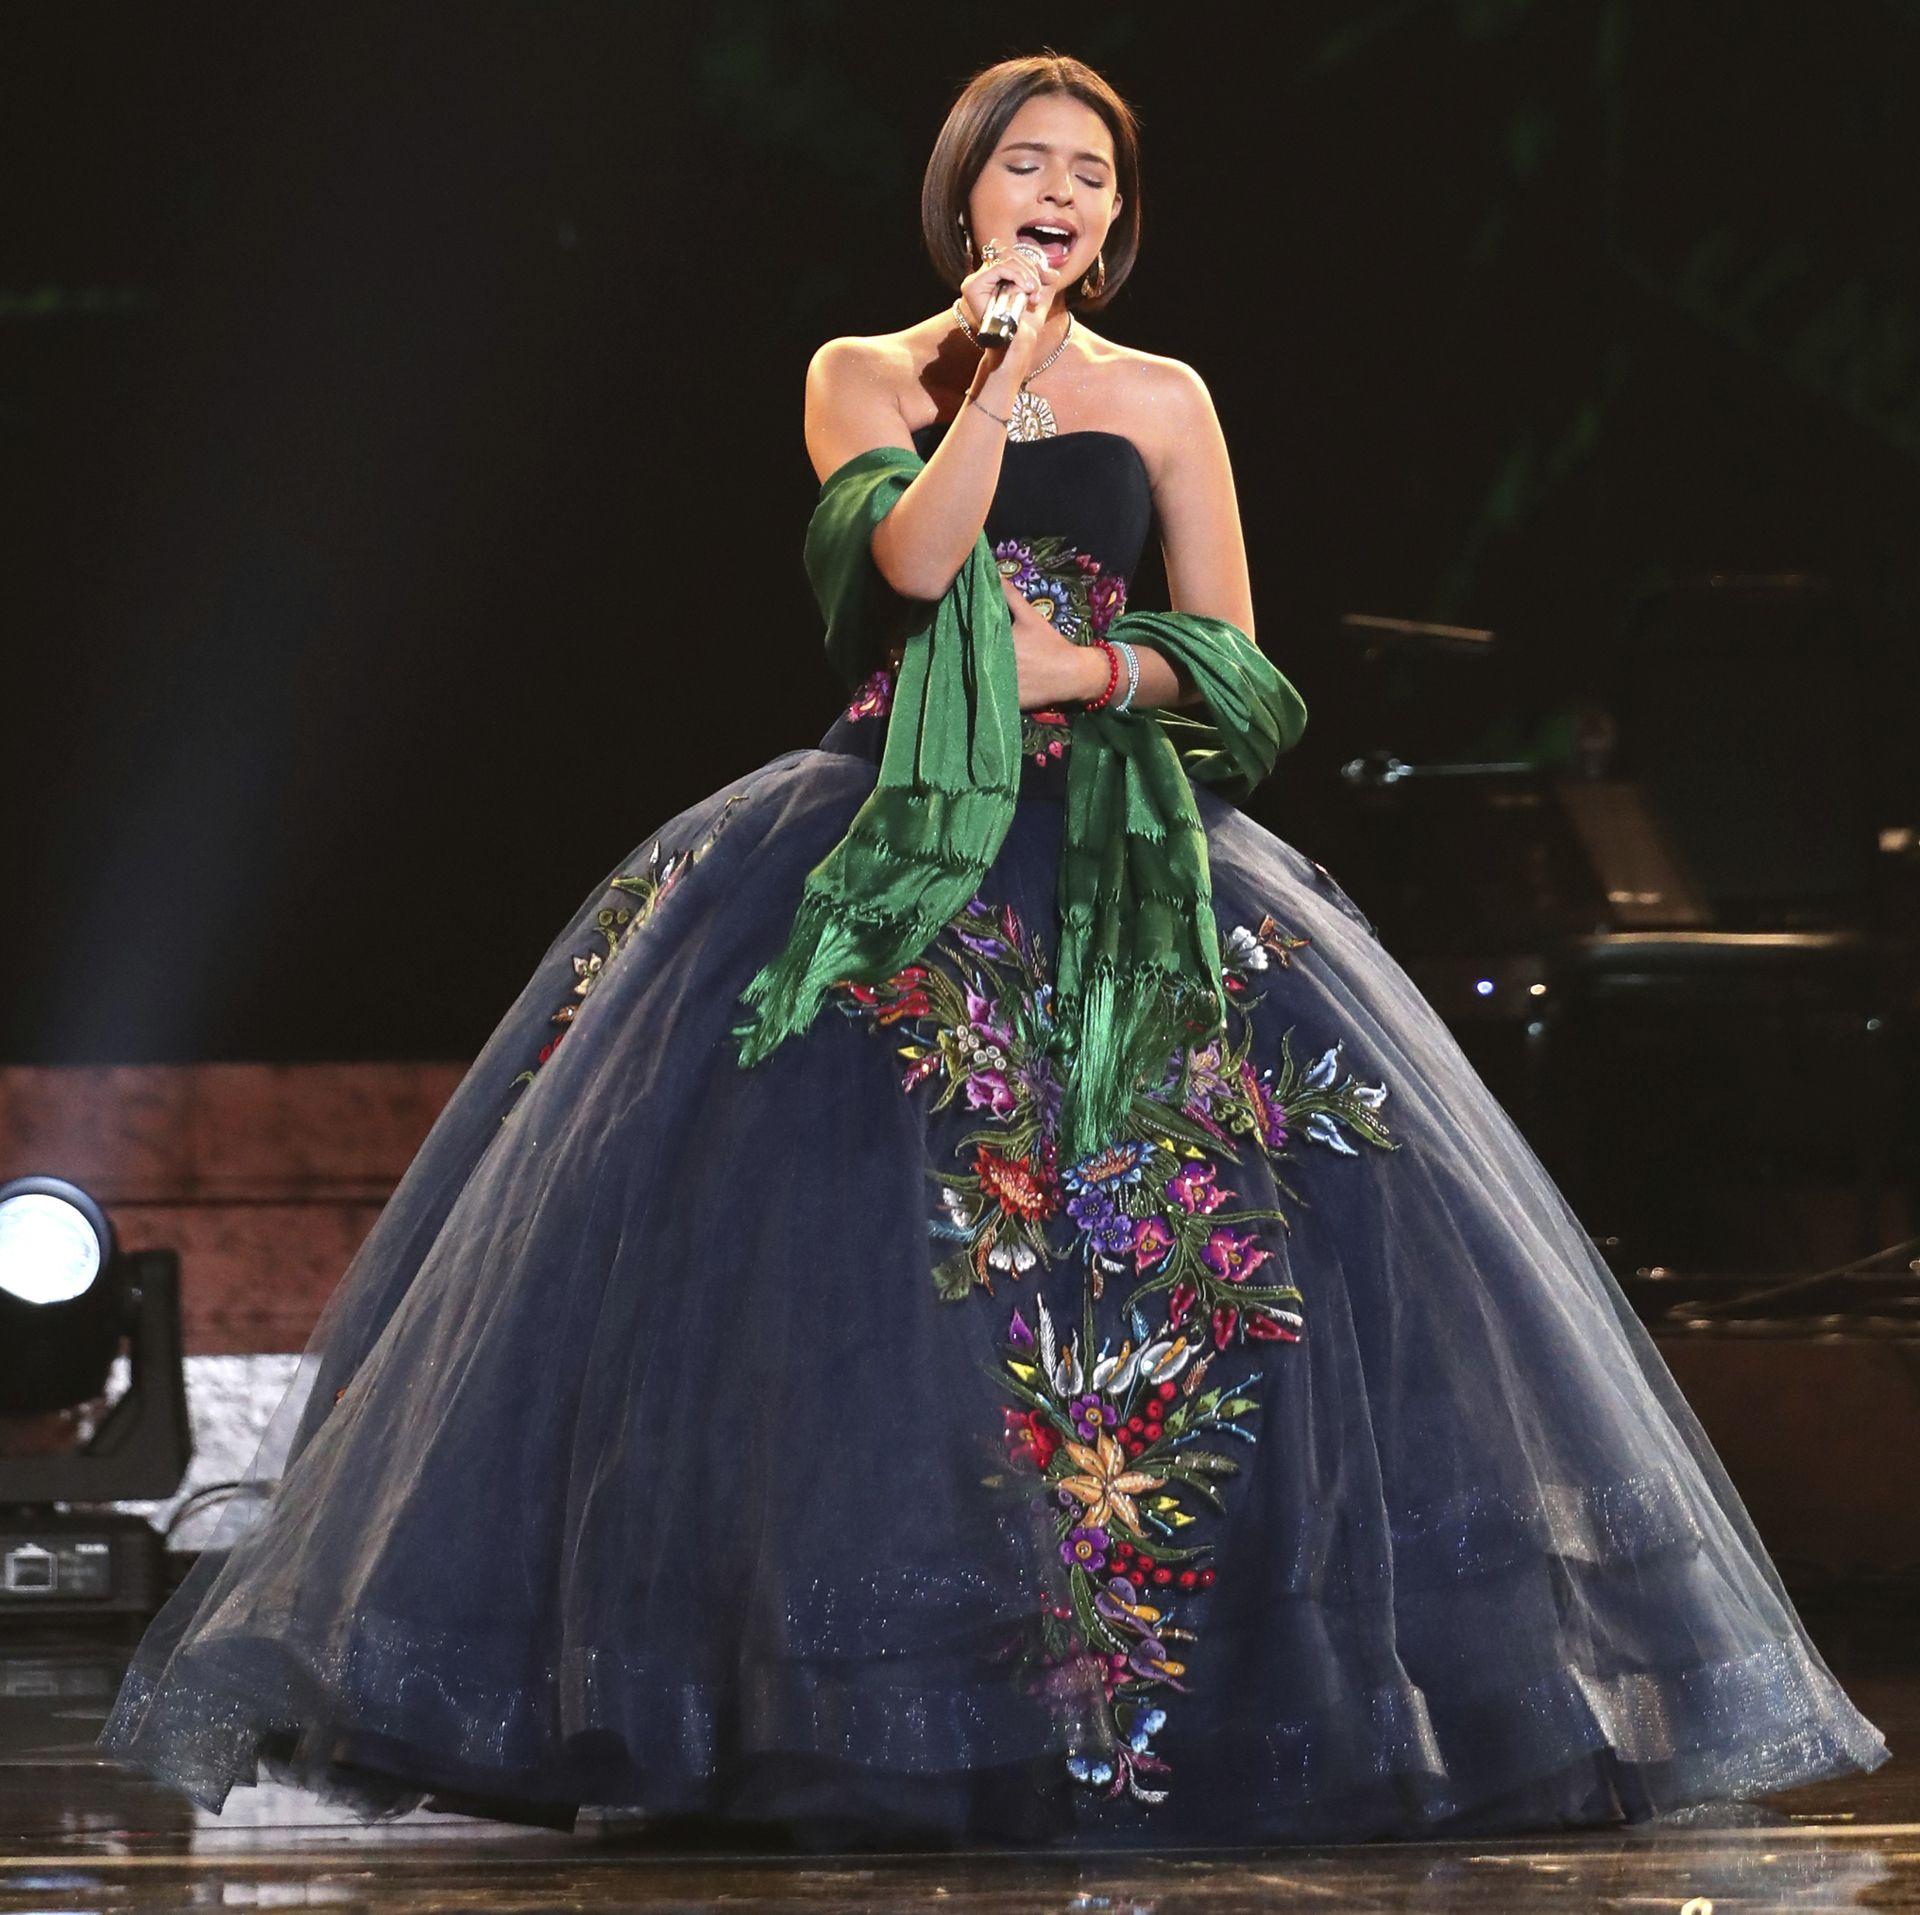 Angela Aguilar Subió Al Escenario A Cantar Con Un Vestido